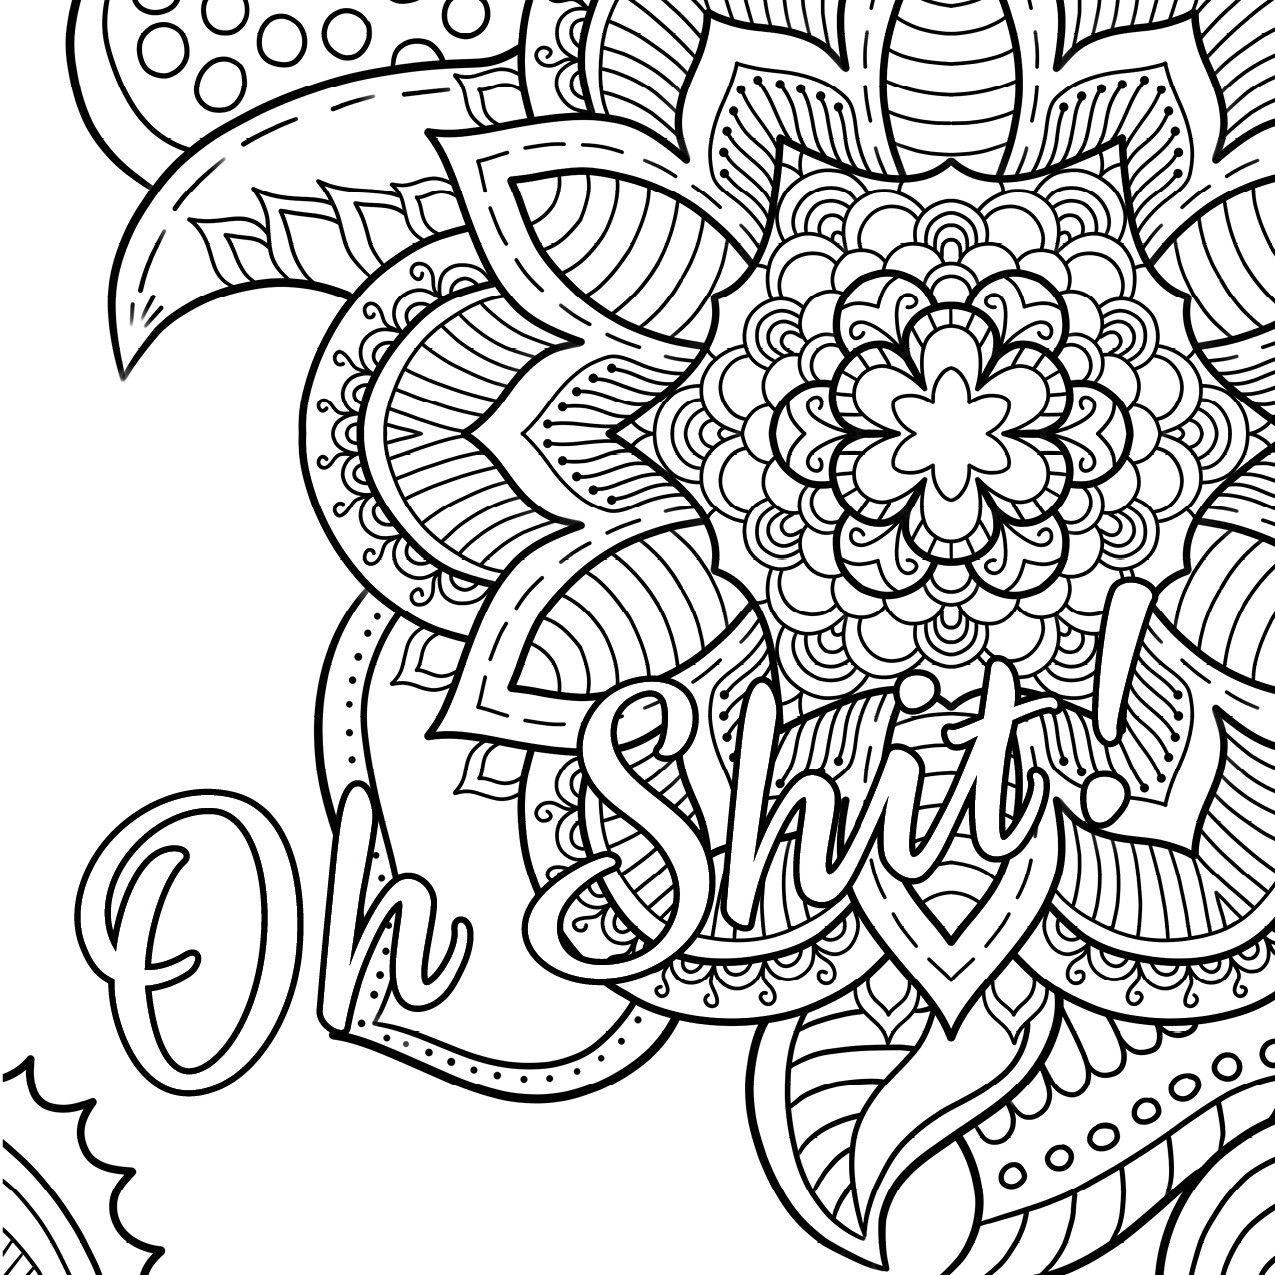 Swear Word Coloring Book #2 Free Printable Coloring Pages For Adults - Free Printable Coloring Pages For Adults Swear Words